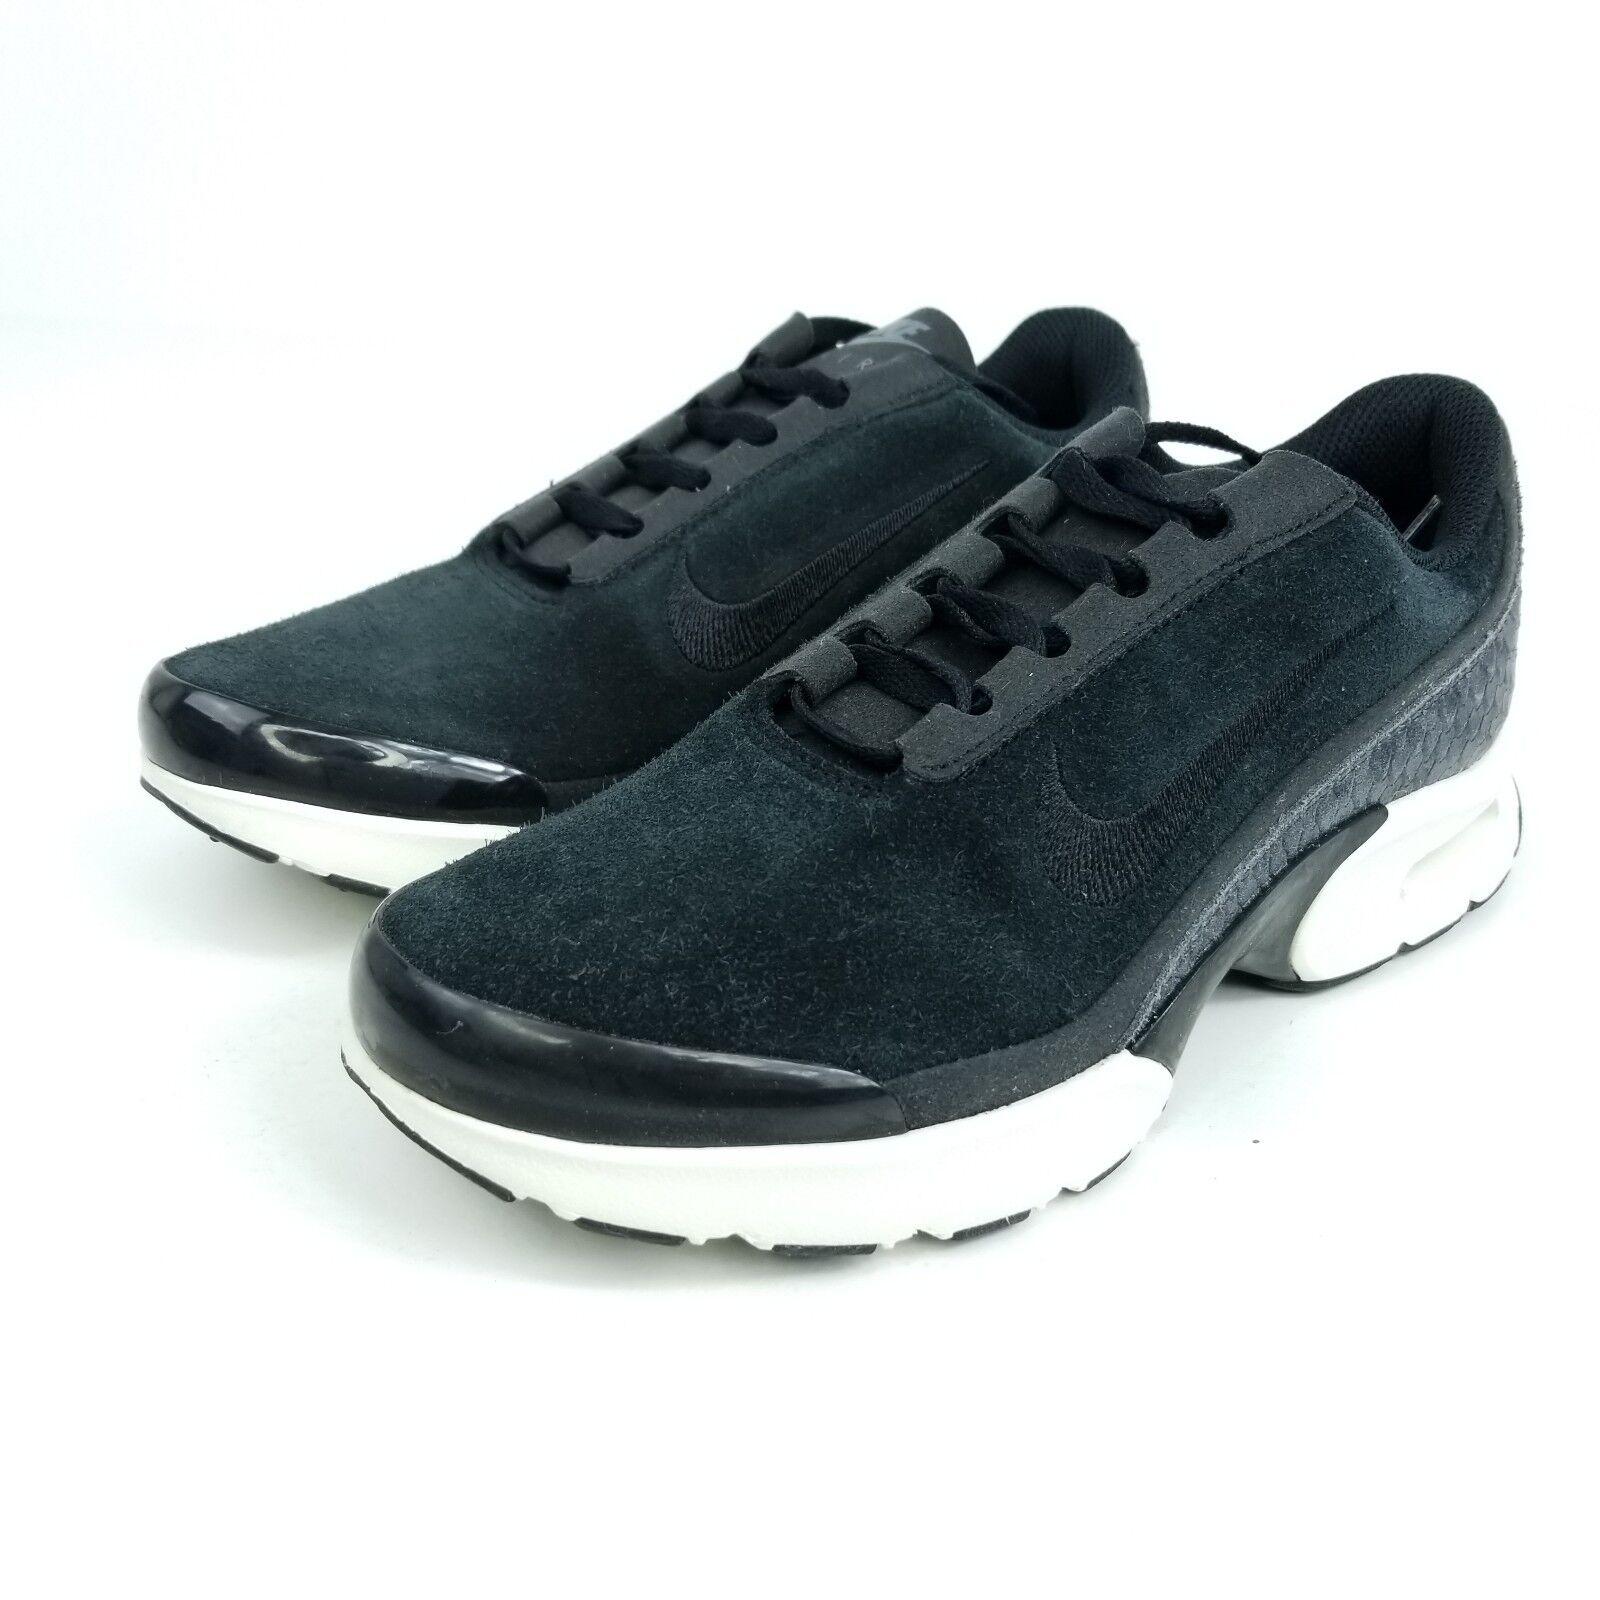 NIKE Air Max Jewell PRM TXT Womens Sz 7.5 shoes Black 917672 002